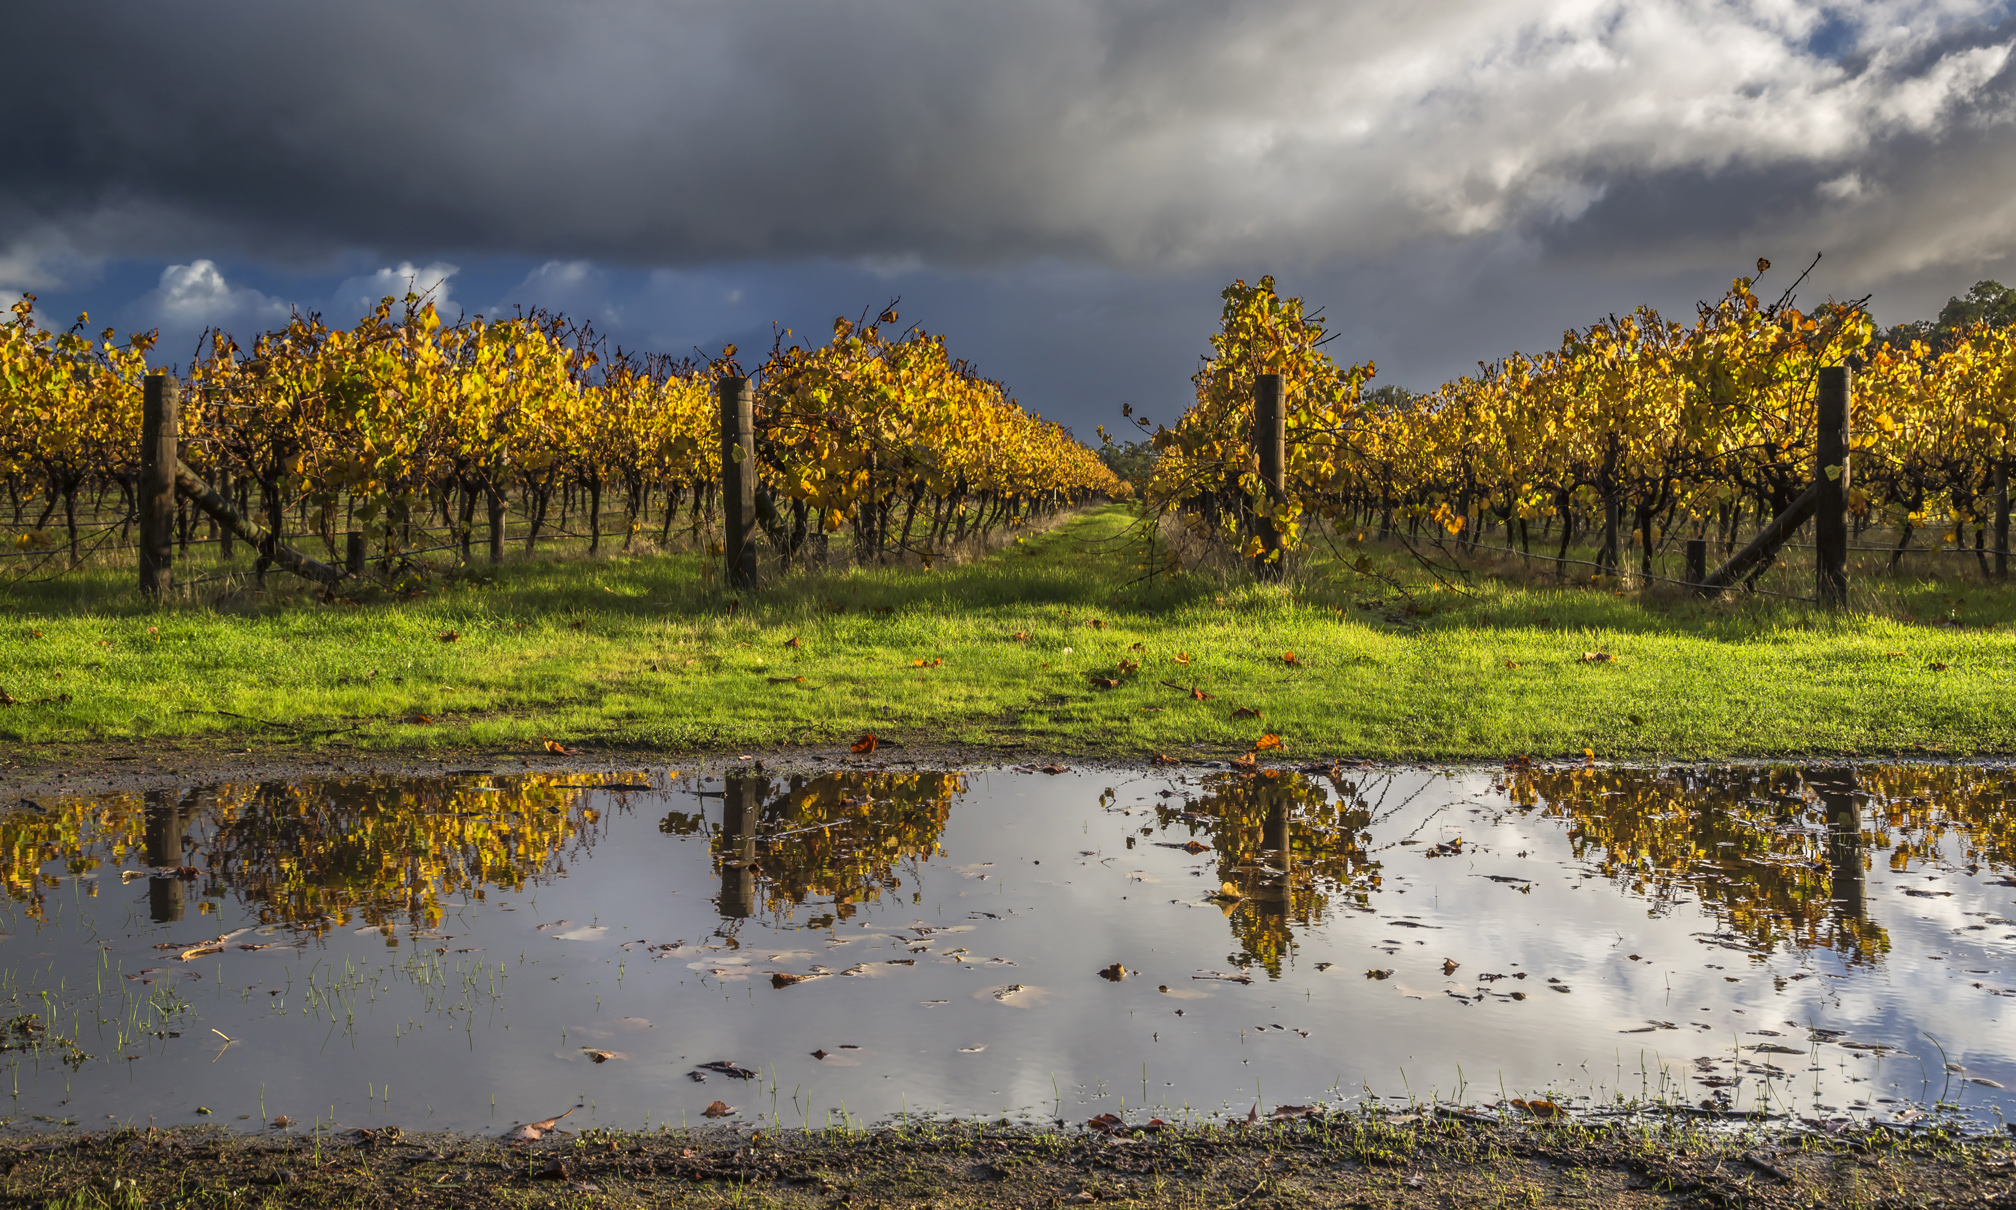 Brash_Vineyard_Reflection_autumn copy